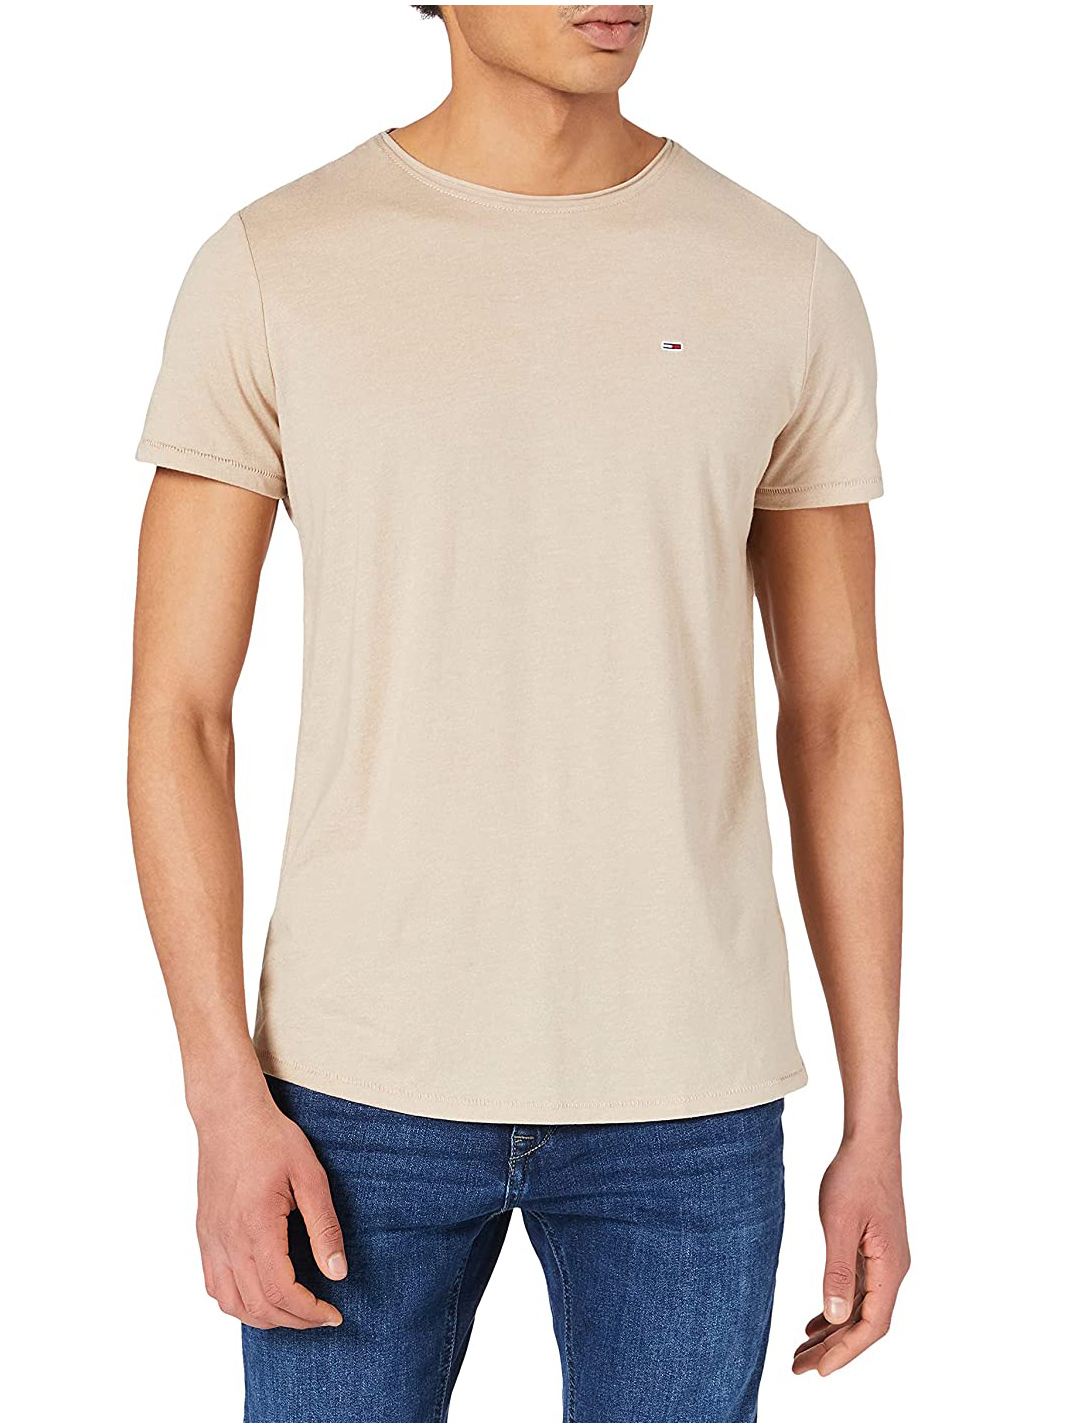 tricko-tommy-hilfiger-jeans-slim-jaspe-dm0dm0-9586-bezova0